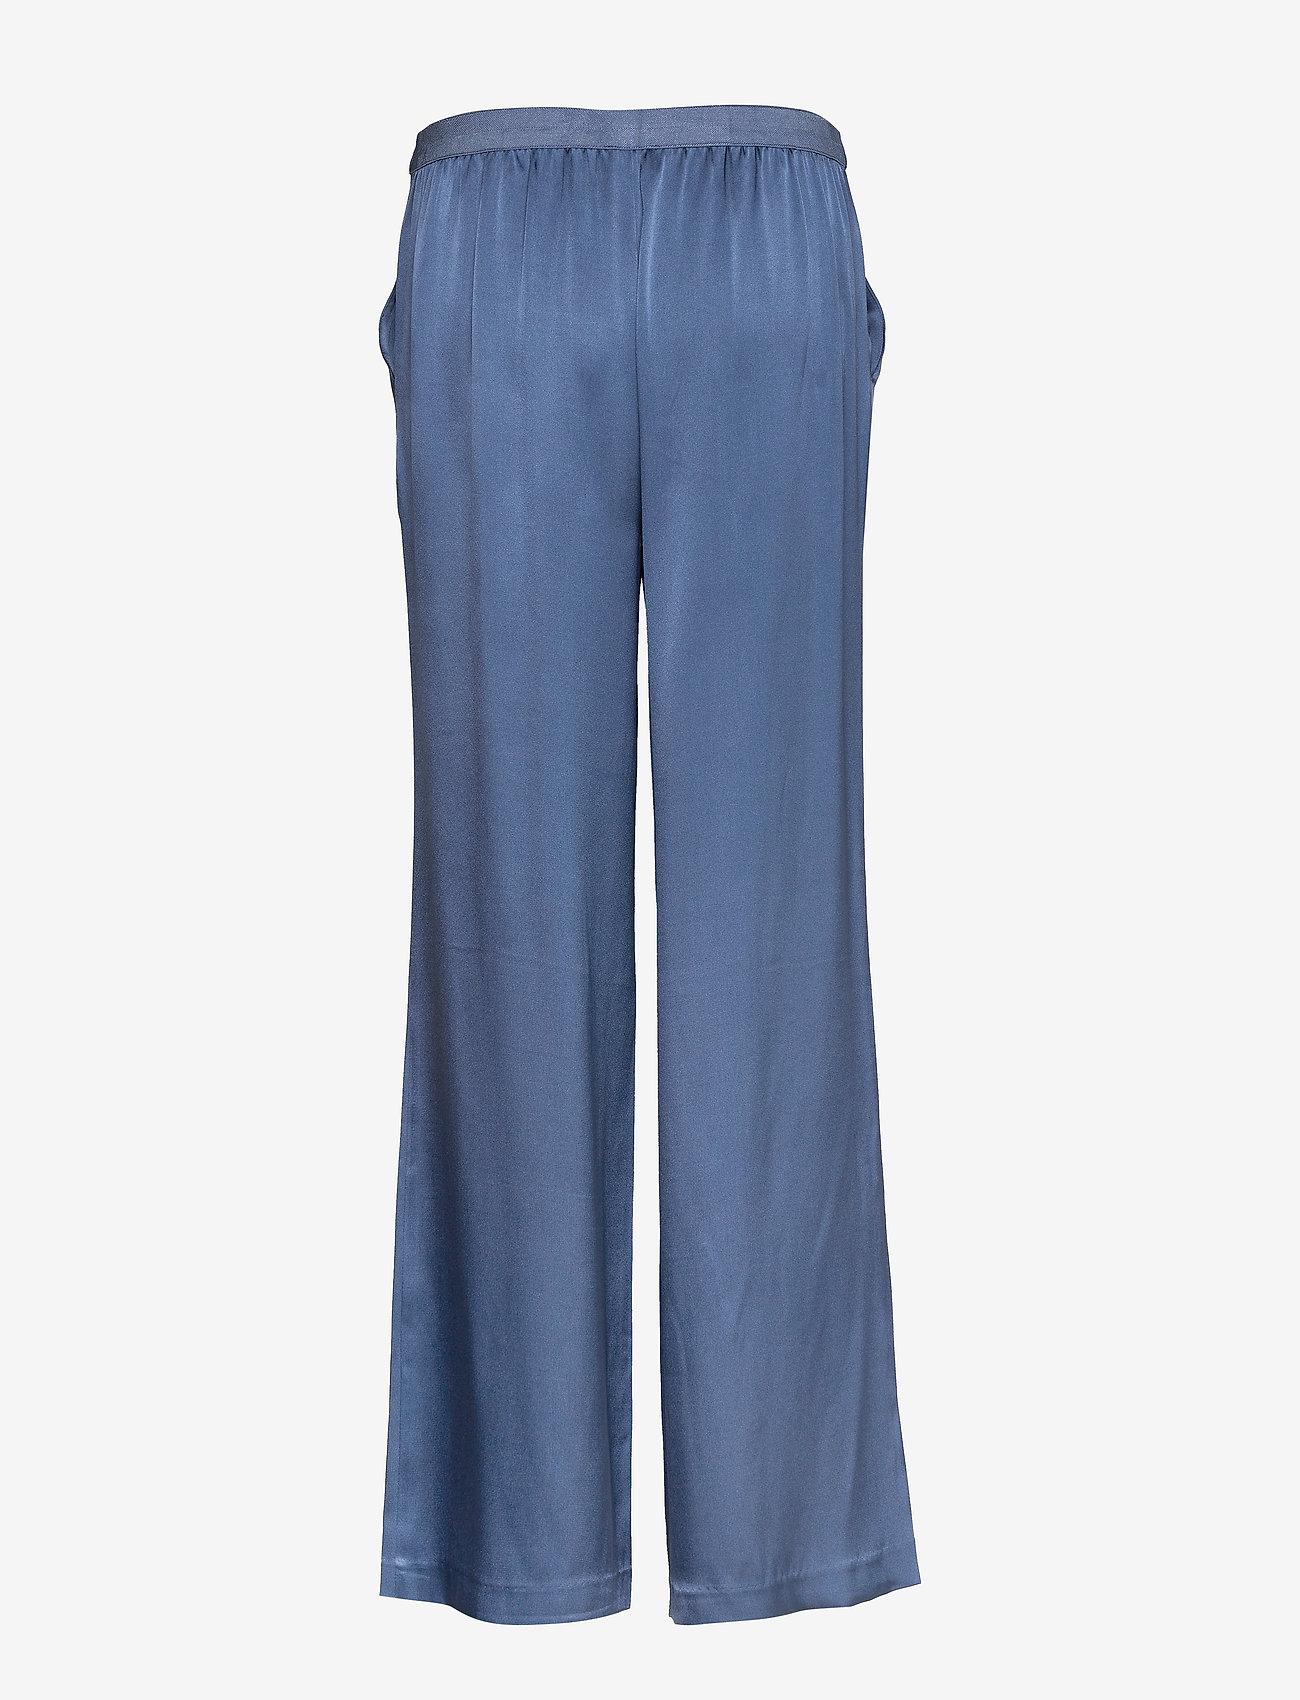 SAND - Double Silk - Sasha Flex Pleated - vida byxor - medium blue - 1